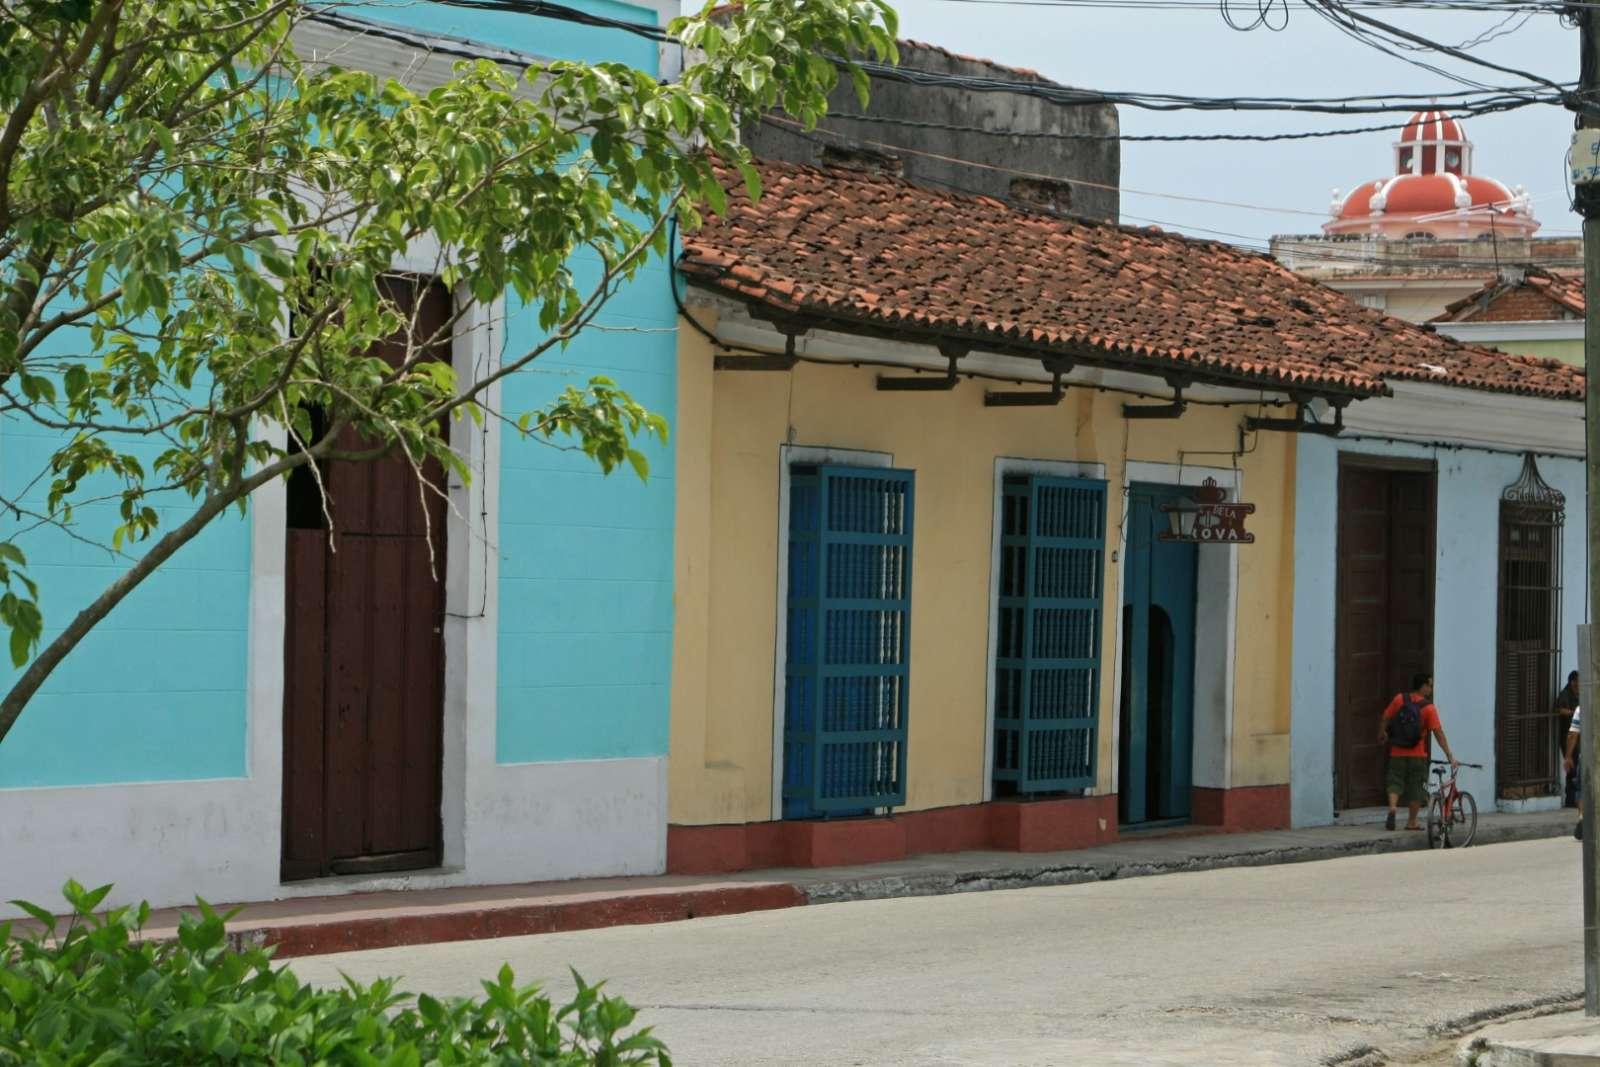 Casa de la Trova in Sancti Spiritus, Cuba